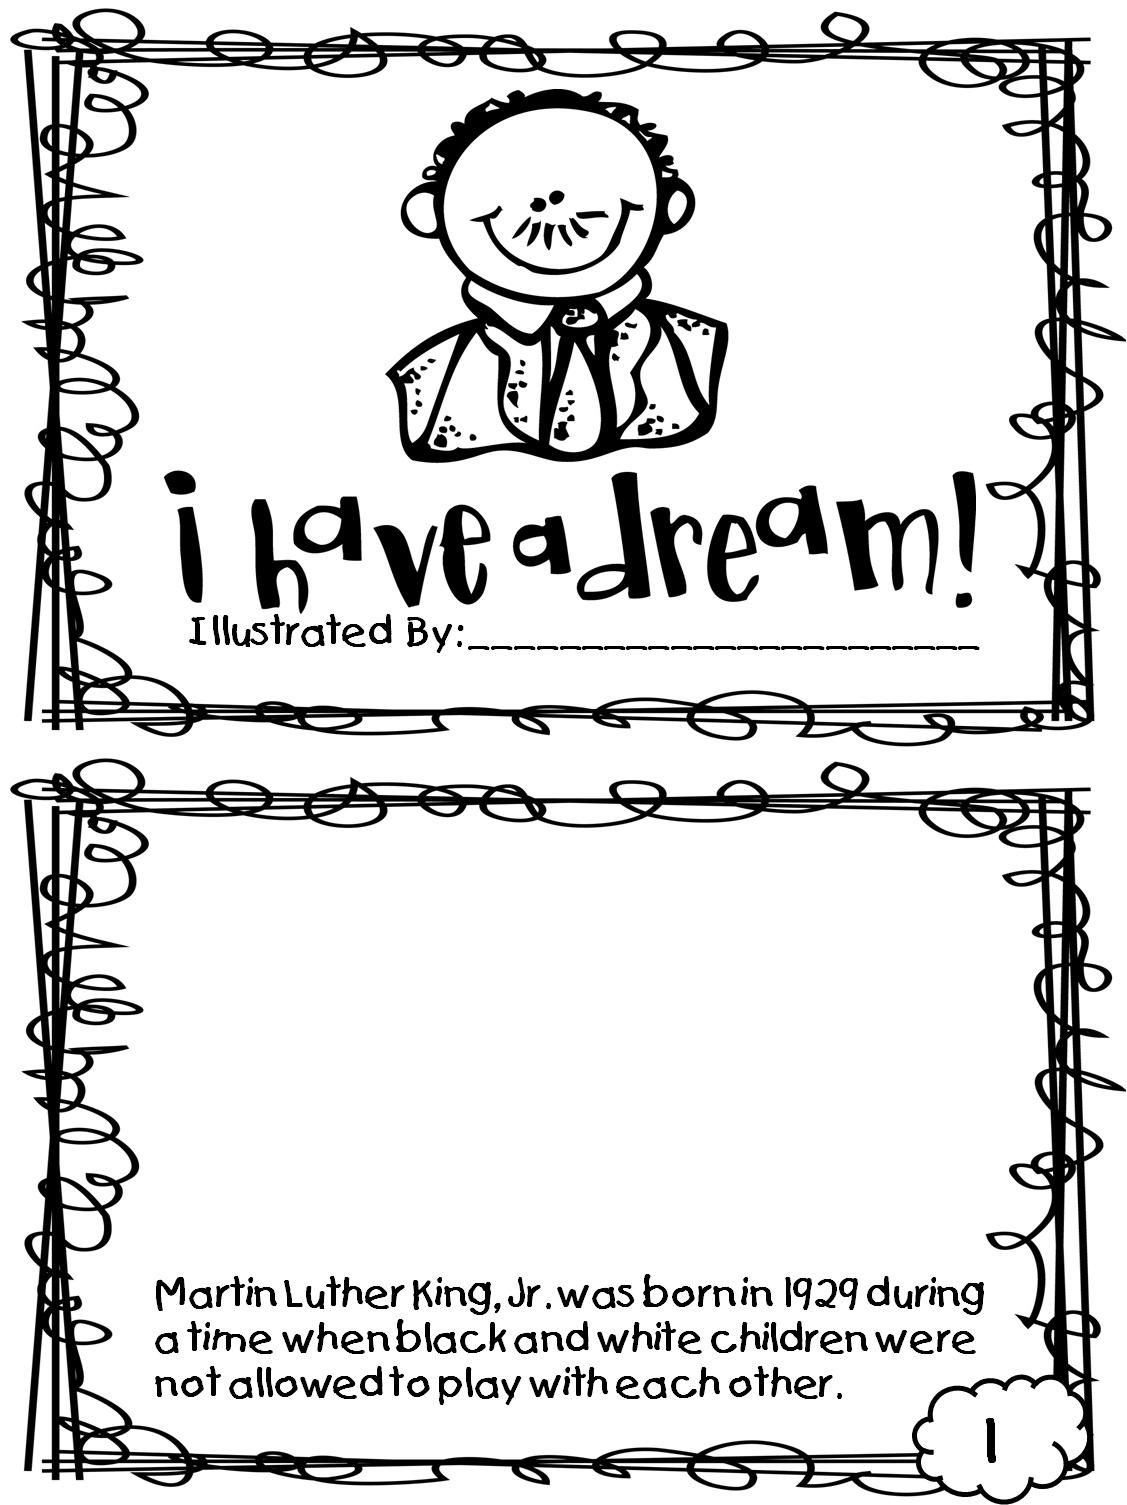 Martin Luther King Jr Coloring Pages And Worksheets - Best Coloring - Free Printable Martin Luther King Jr Worksheets For Kindergarten